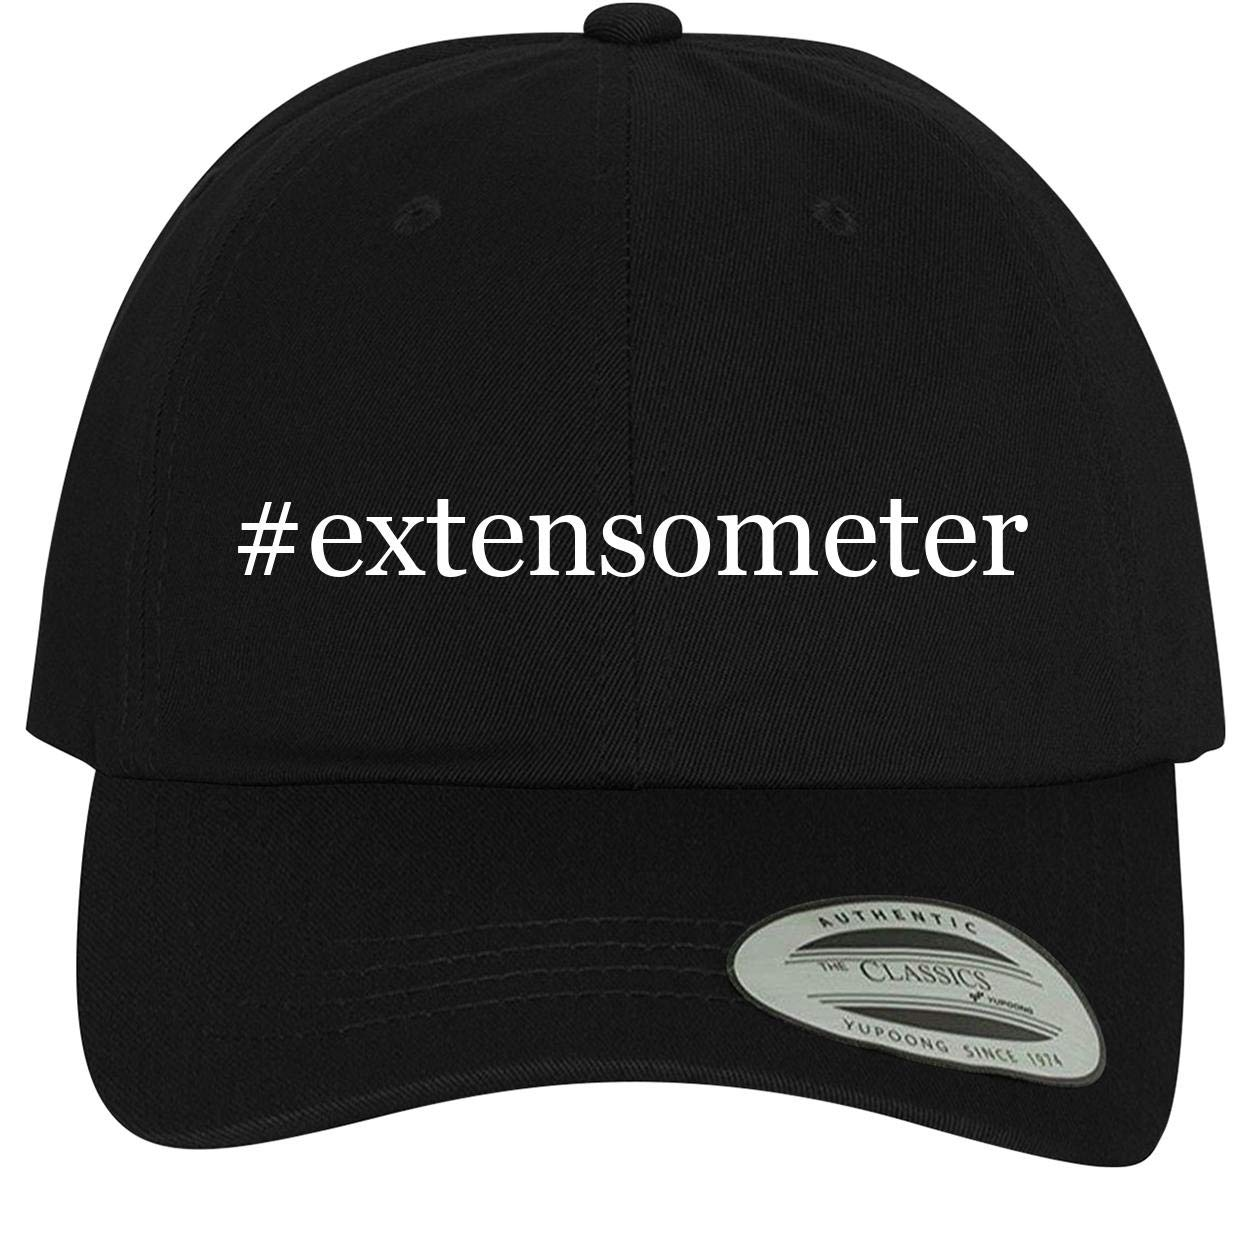 BH Cool Designs #Extensometer Comfortable Dad Hat Baseball Cap